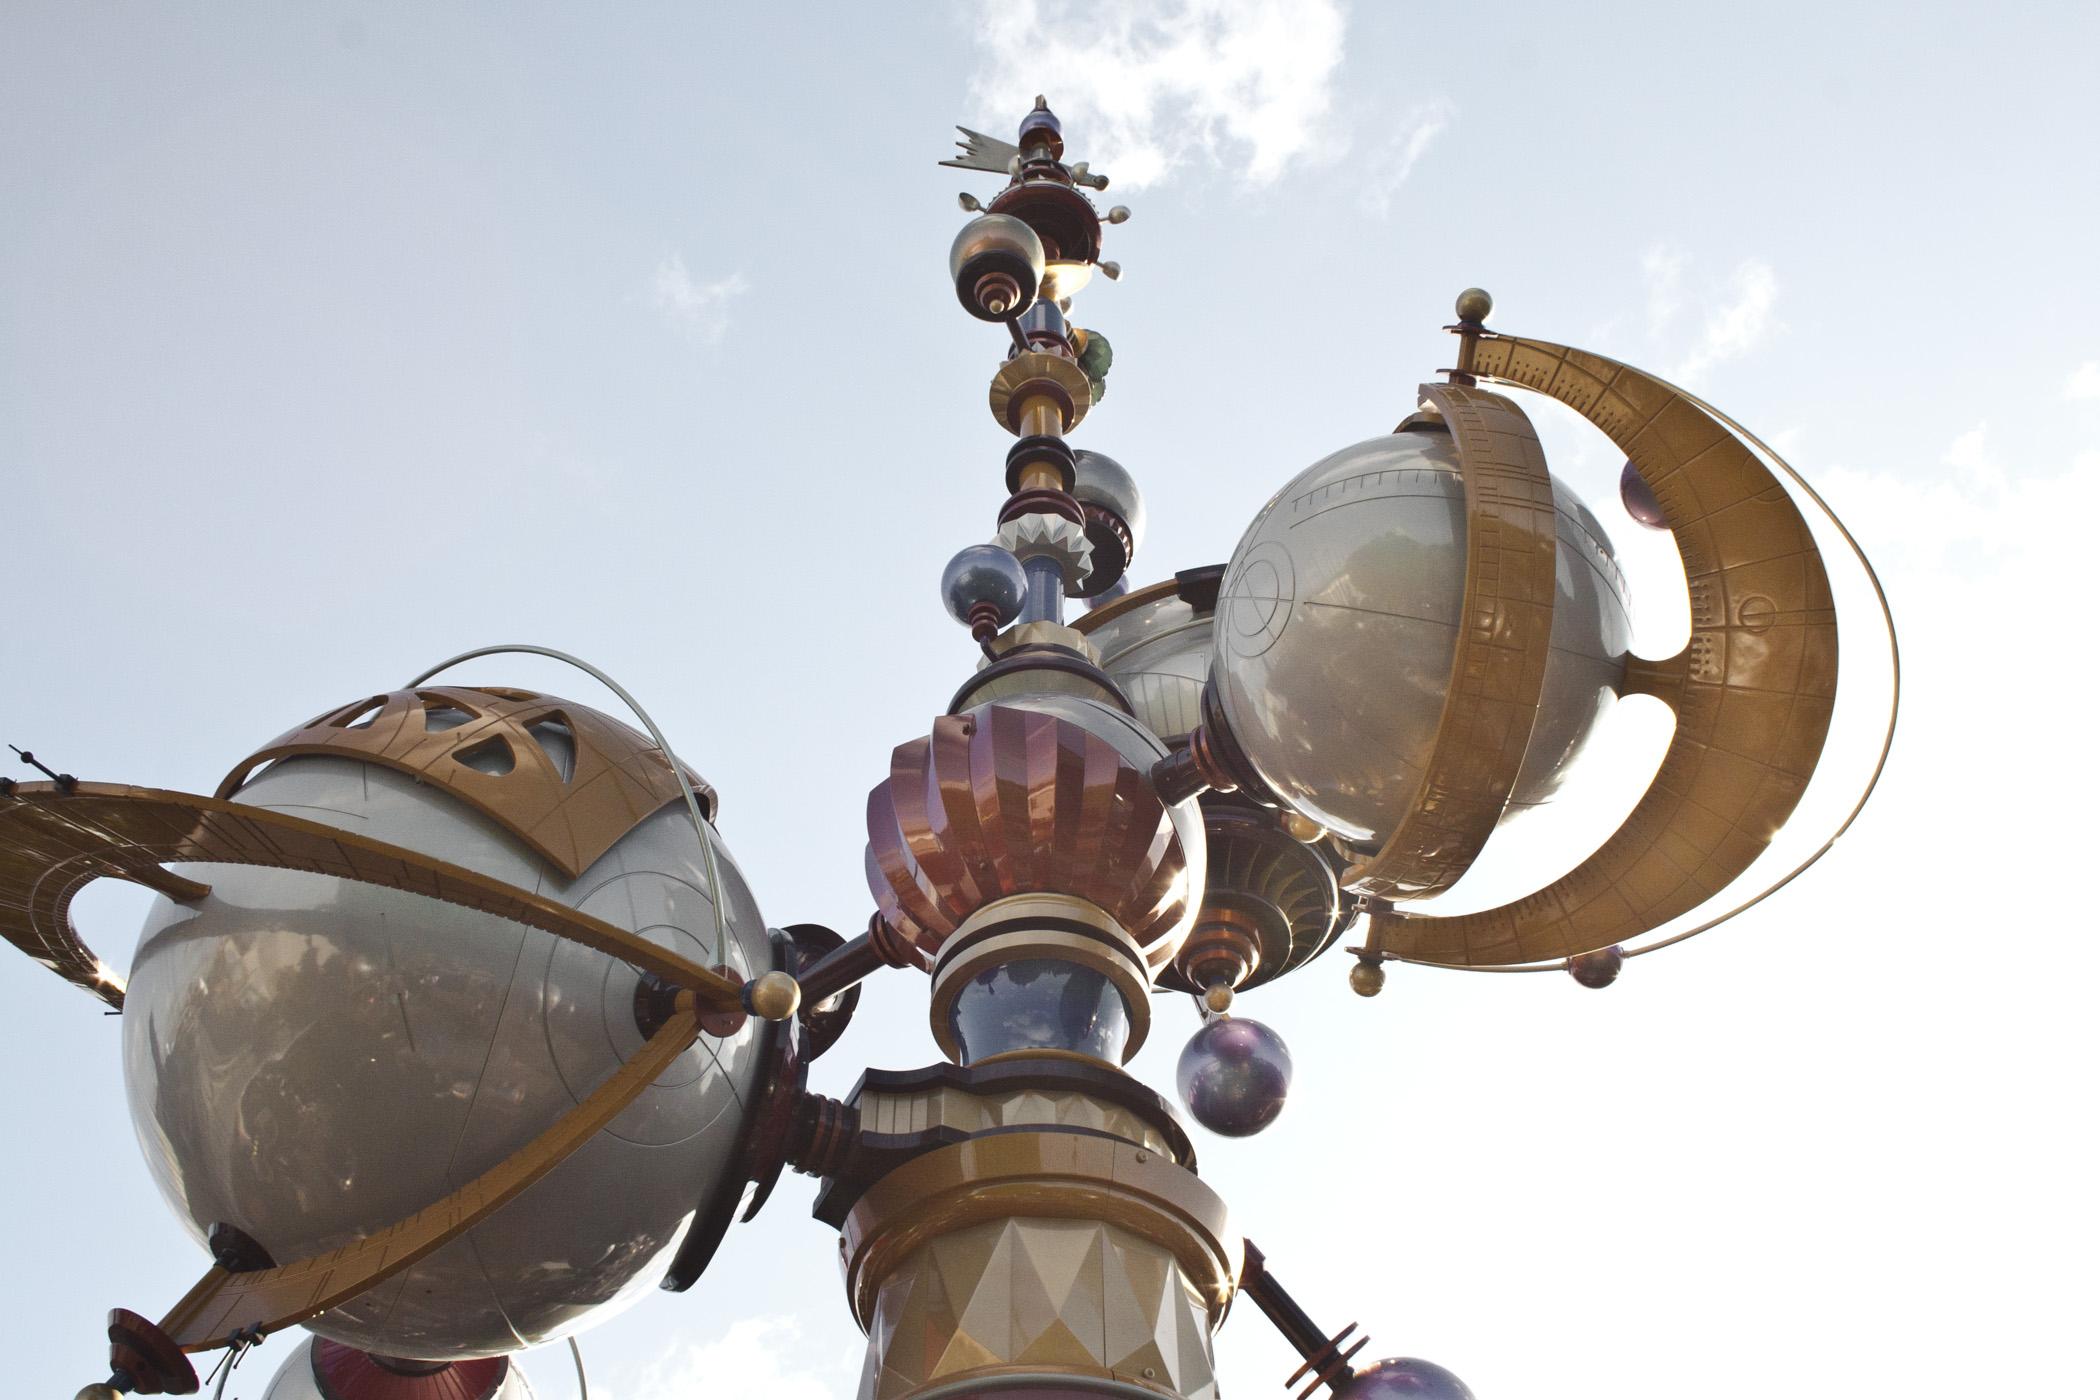 Disneyland2011_034.jpg